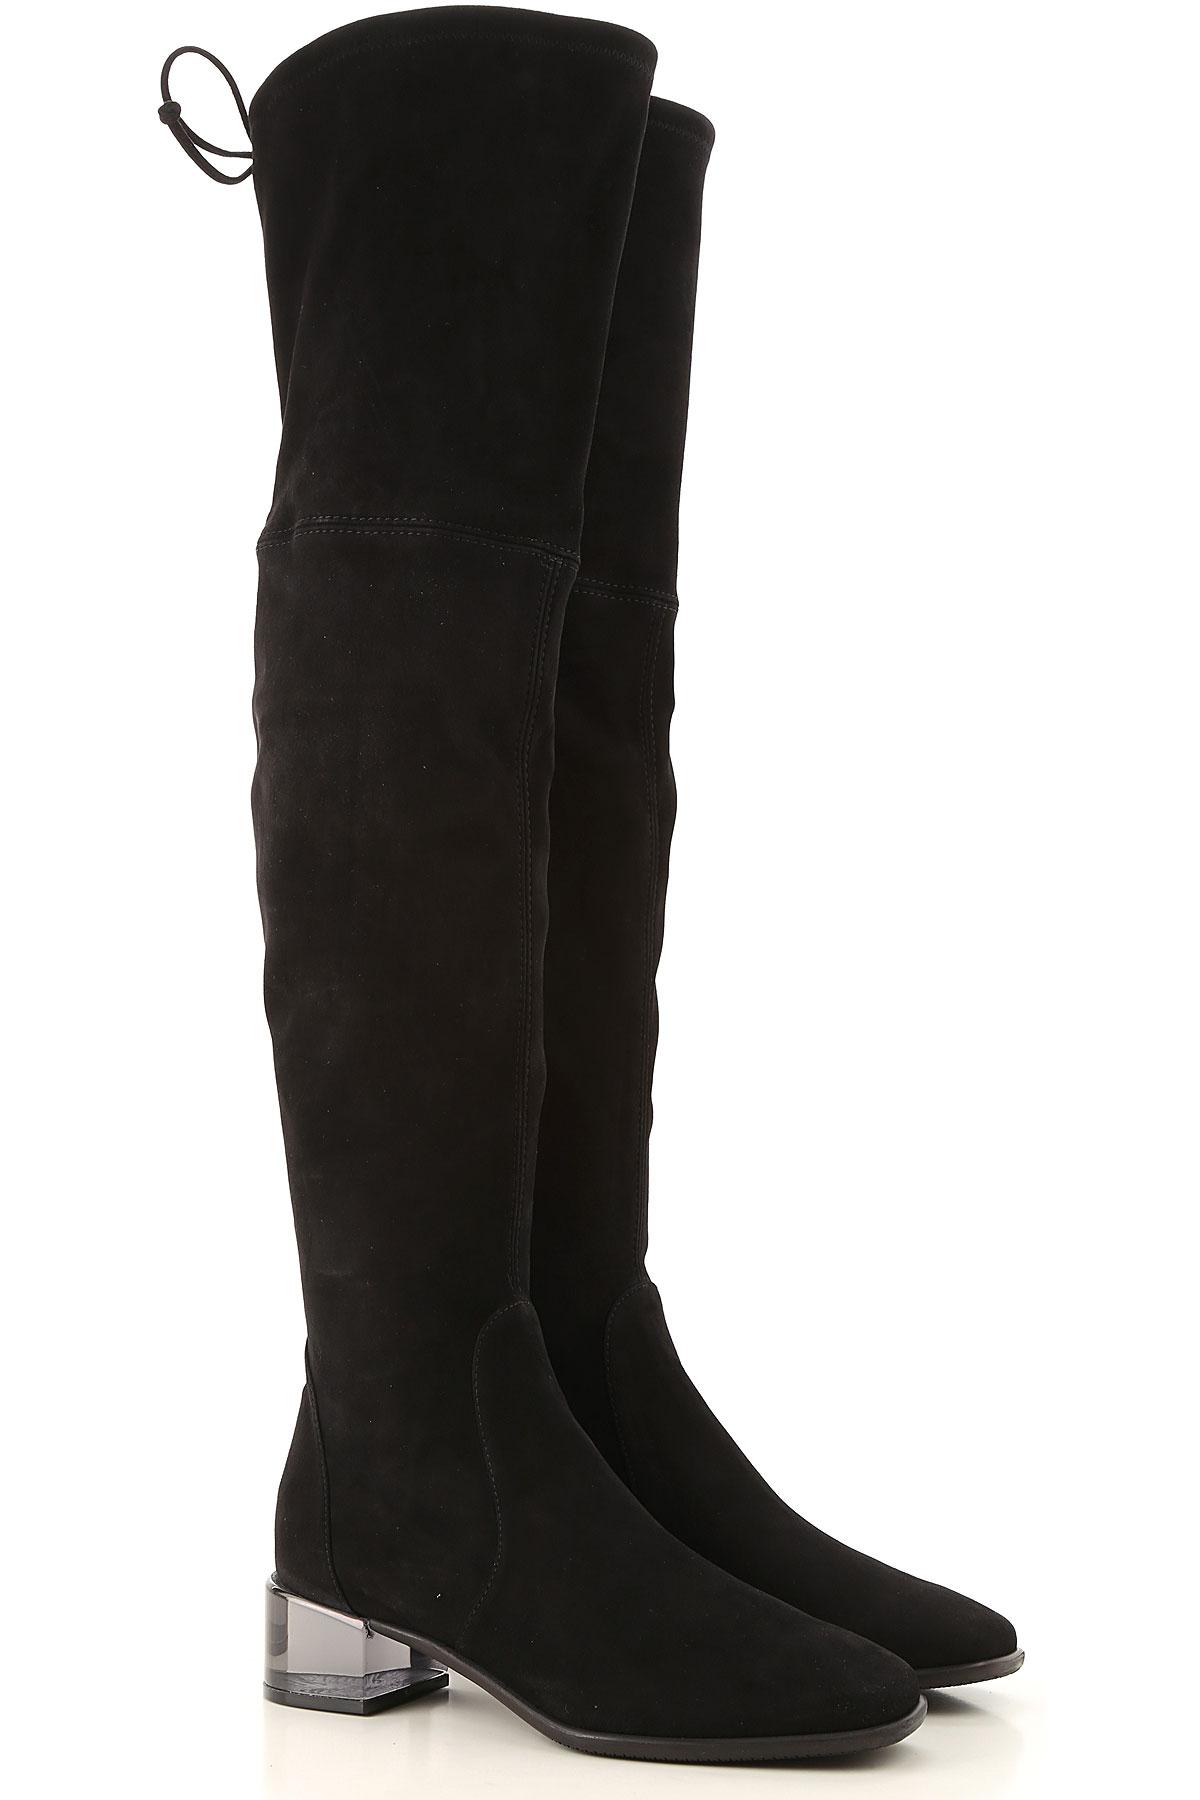 Stuart Weitzman Boots for Women, Booties On Sale, Black, Suede leather, 2019, US 5.5 (EU 36) US 6.5 (EU 37) US 7.5 (EU 38) US 9.5 (EU 40)